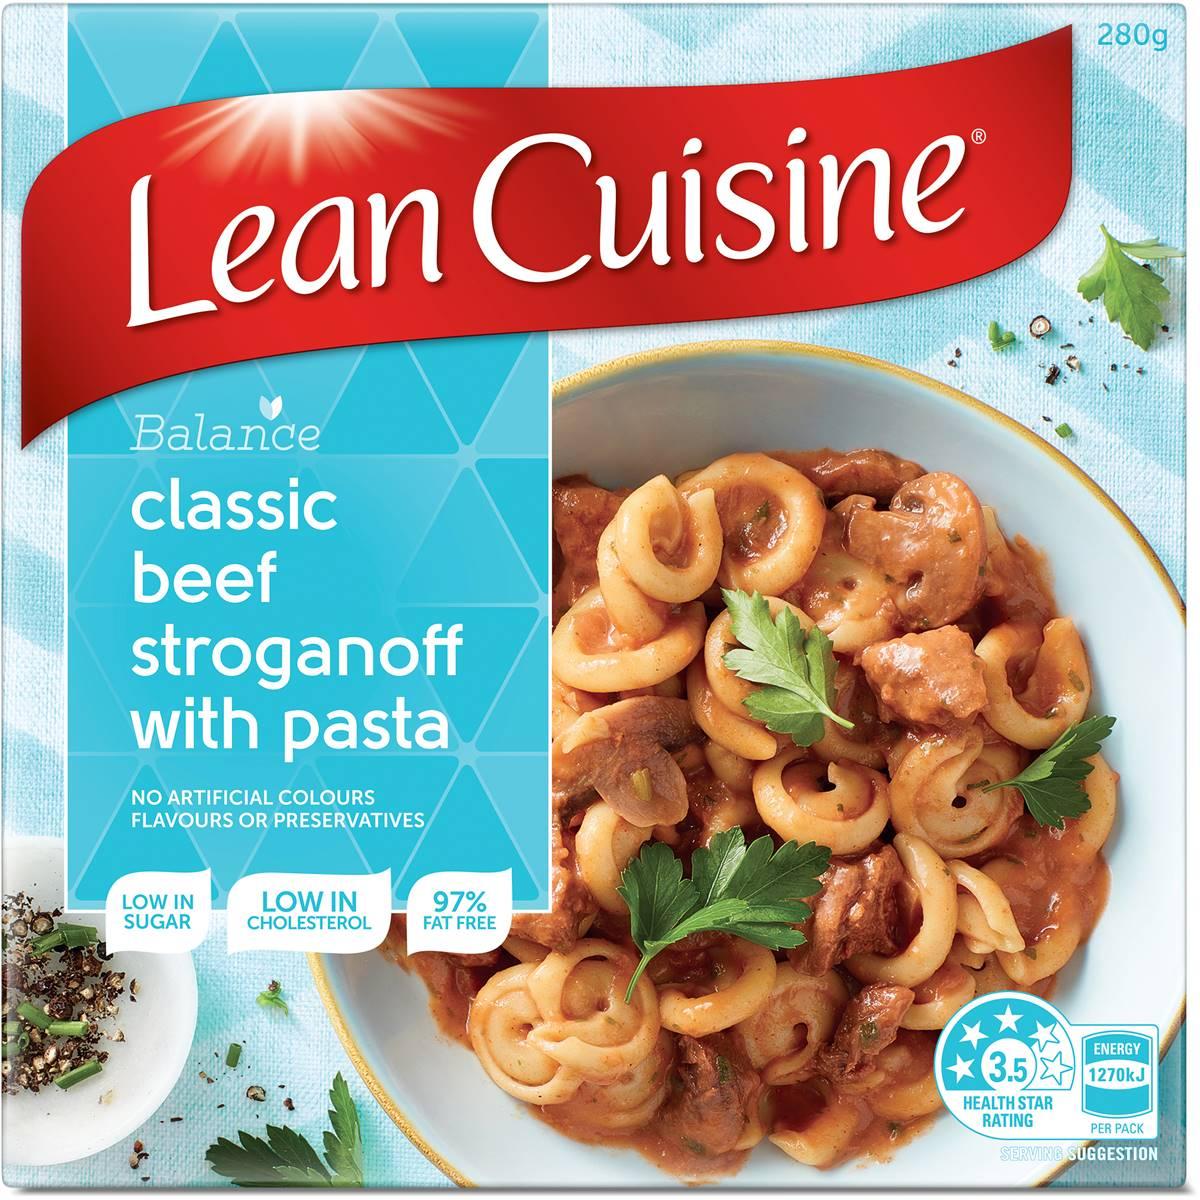 Woolworths lean cuisine balanced serve beef stroganoff for Average price of lean cuisine